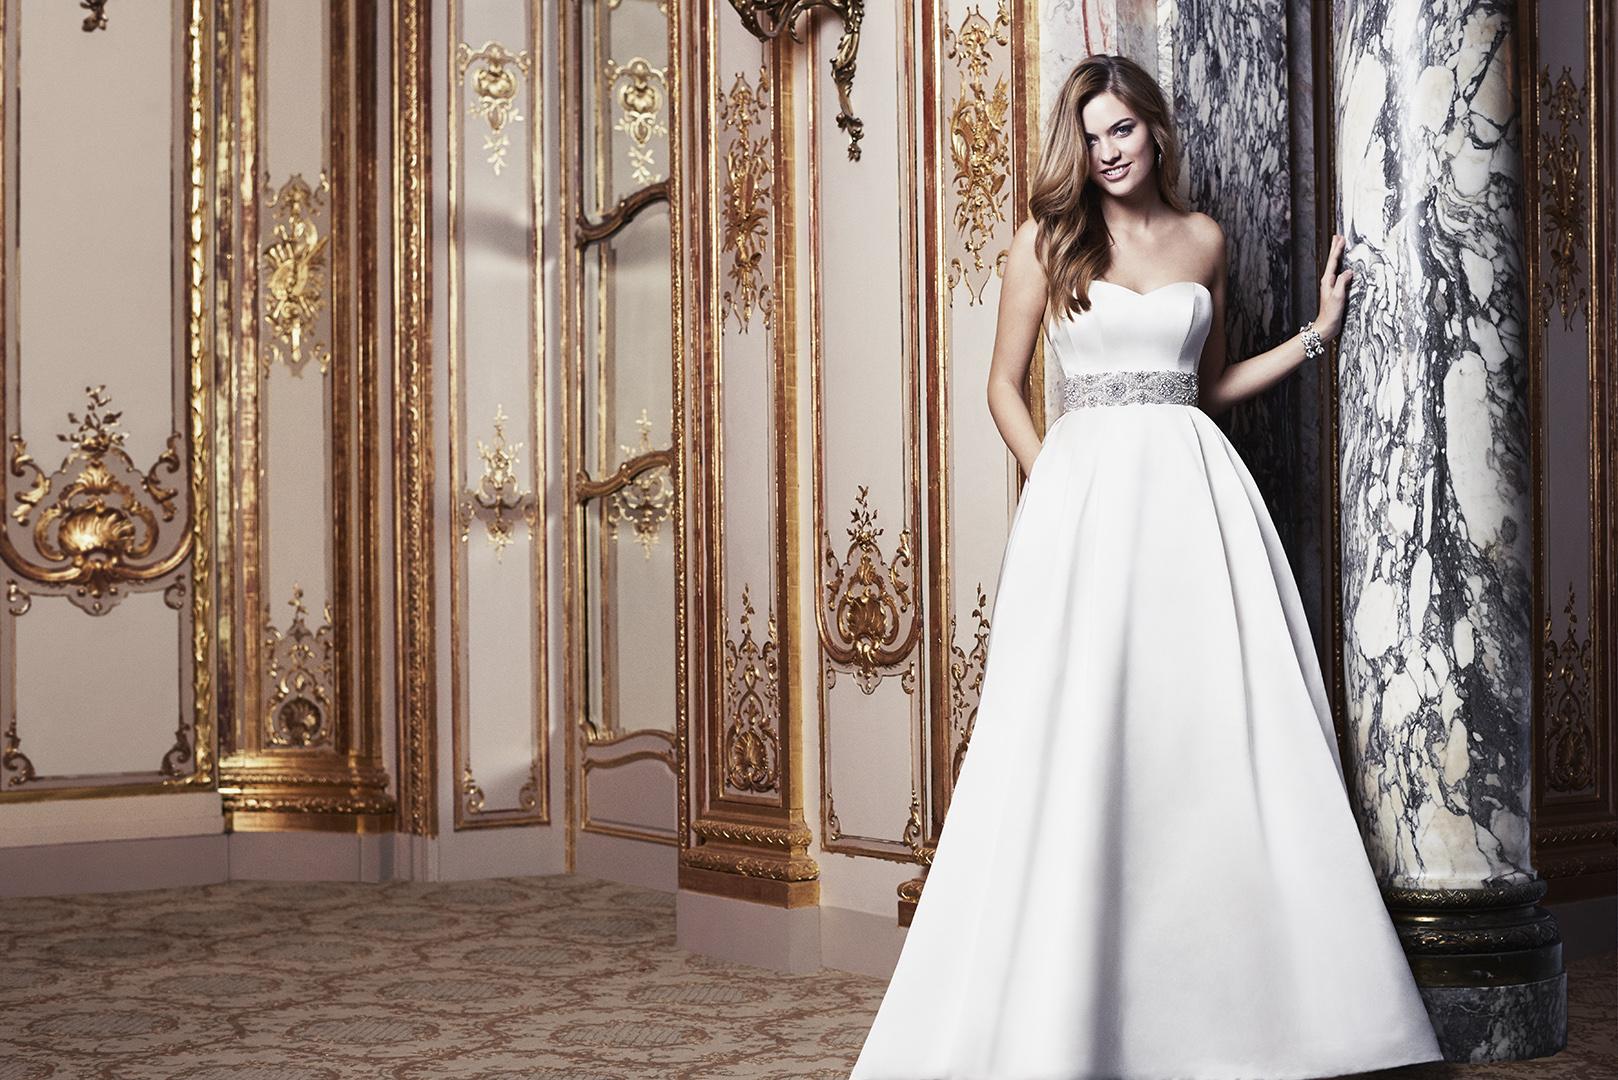 Exclusive caroline castigliano sample sale caroline for Designer sample wedding dresses